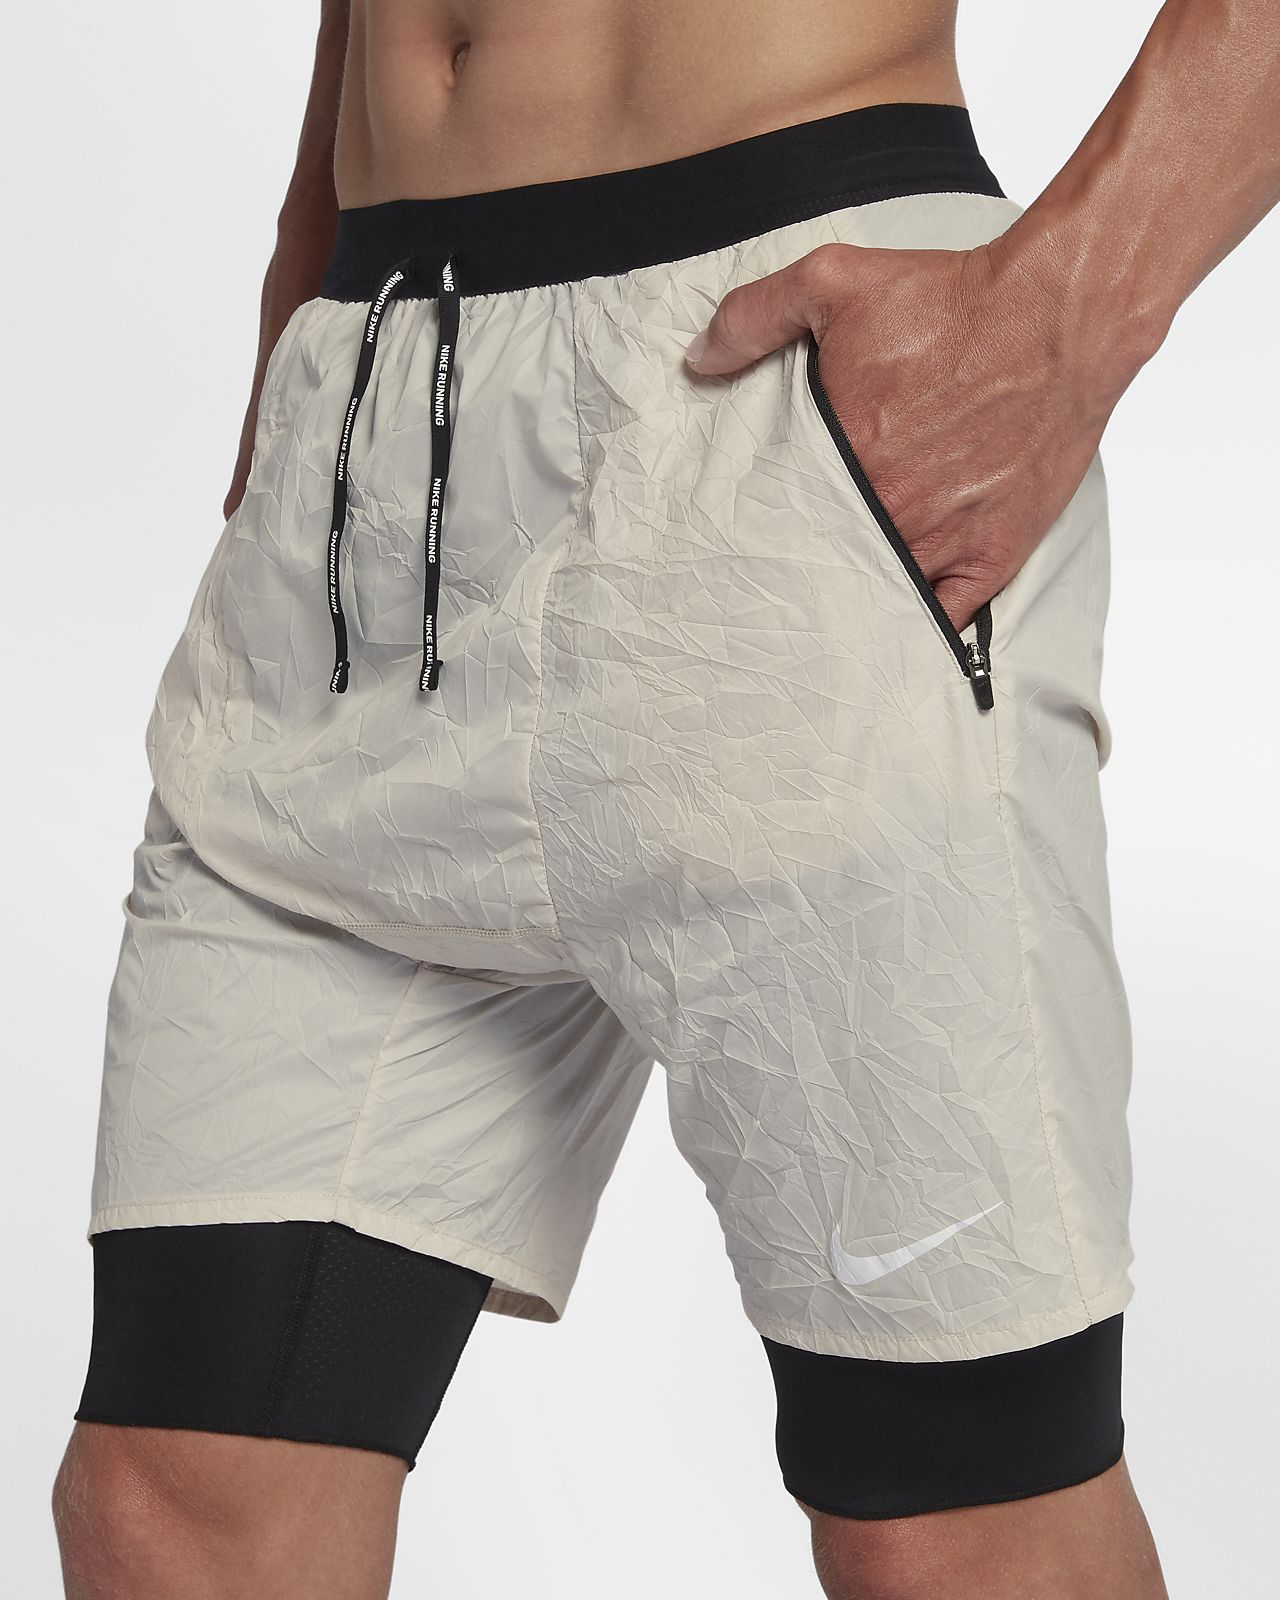 9098a6cff ... Shorts de running 2 en 1 para hombre Nike Flex Run Division Stride  Elevate